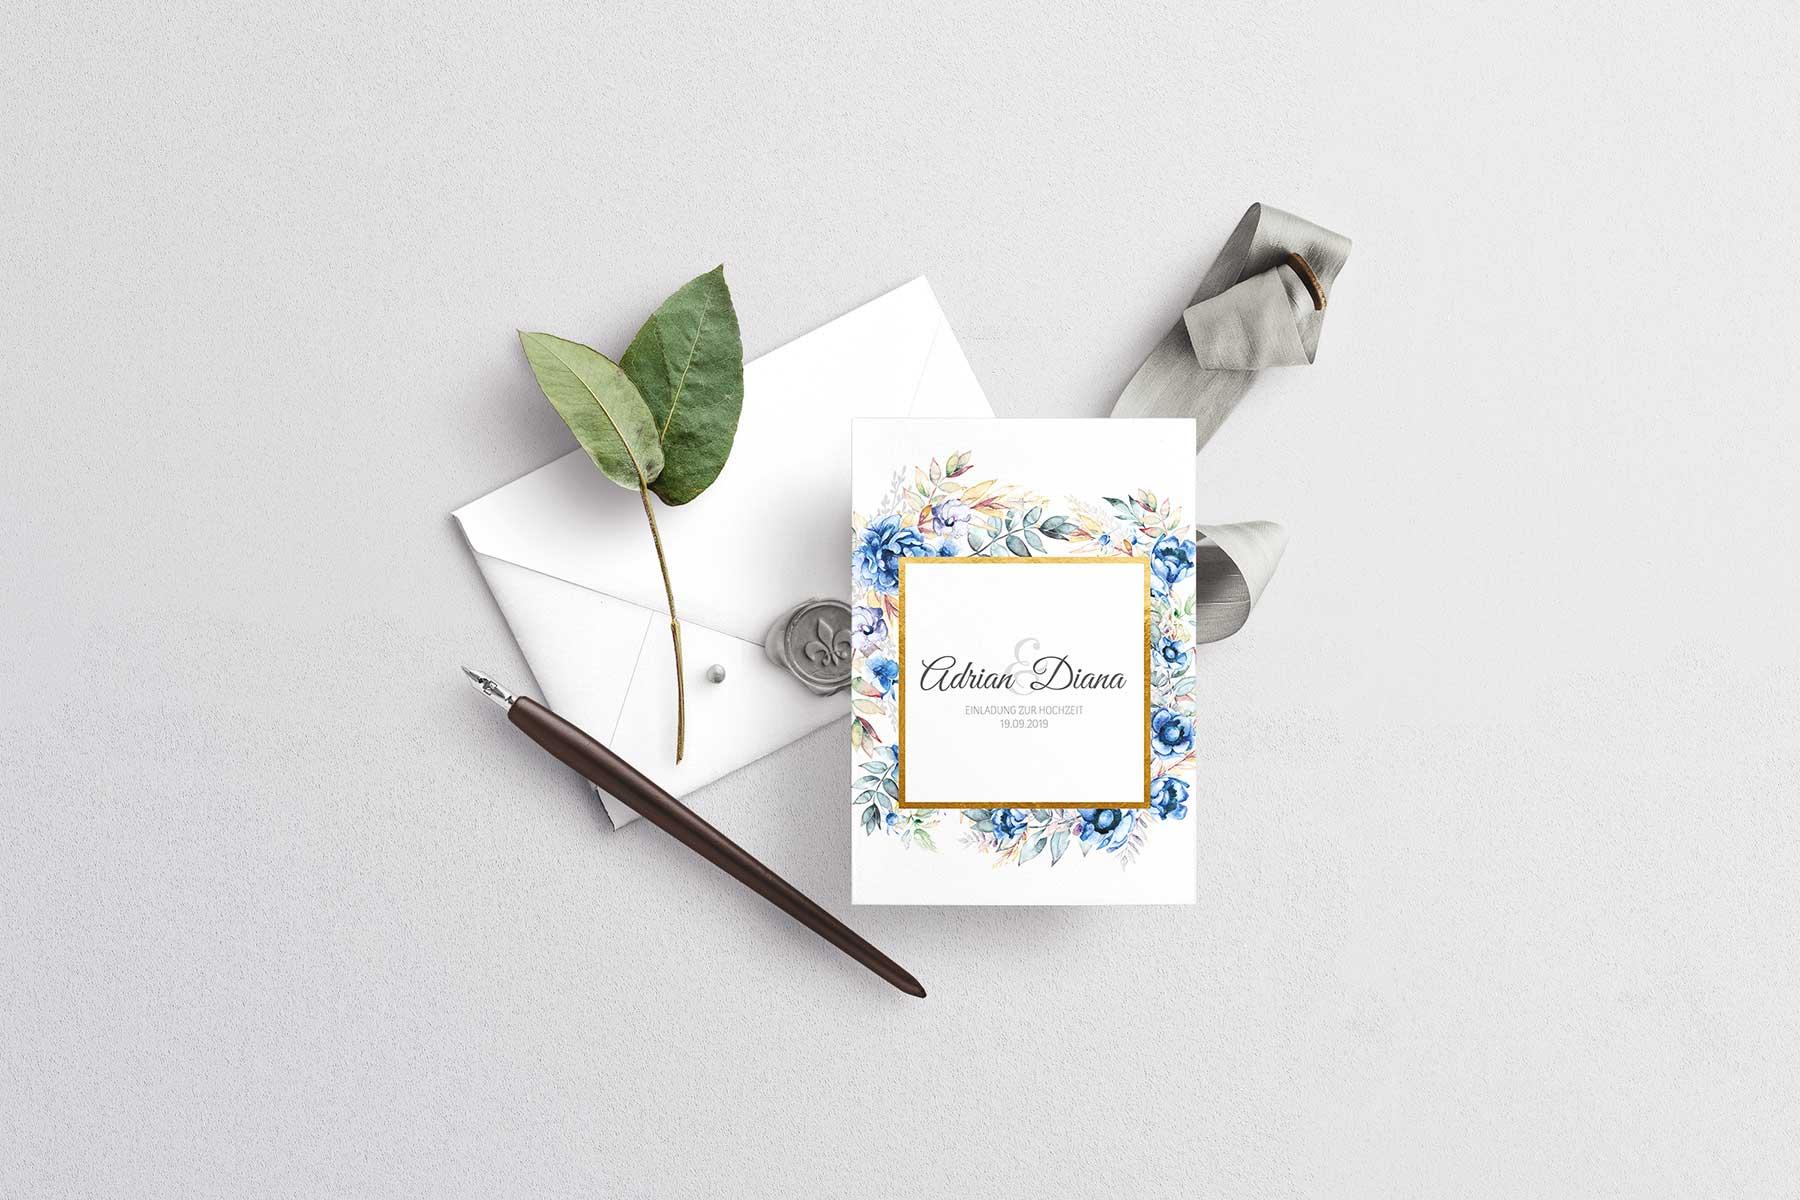 Papeterie-Serie Blue Floral: Einladungskarte